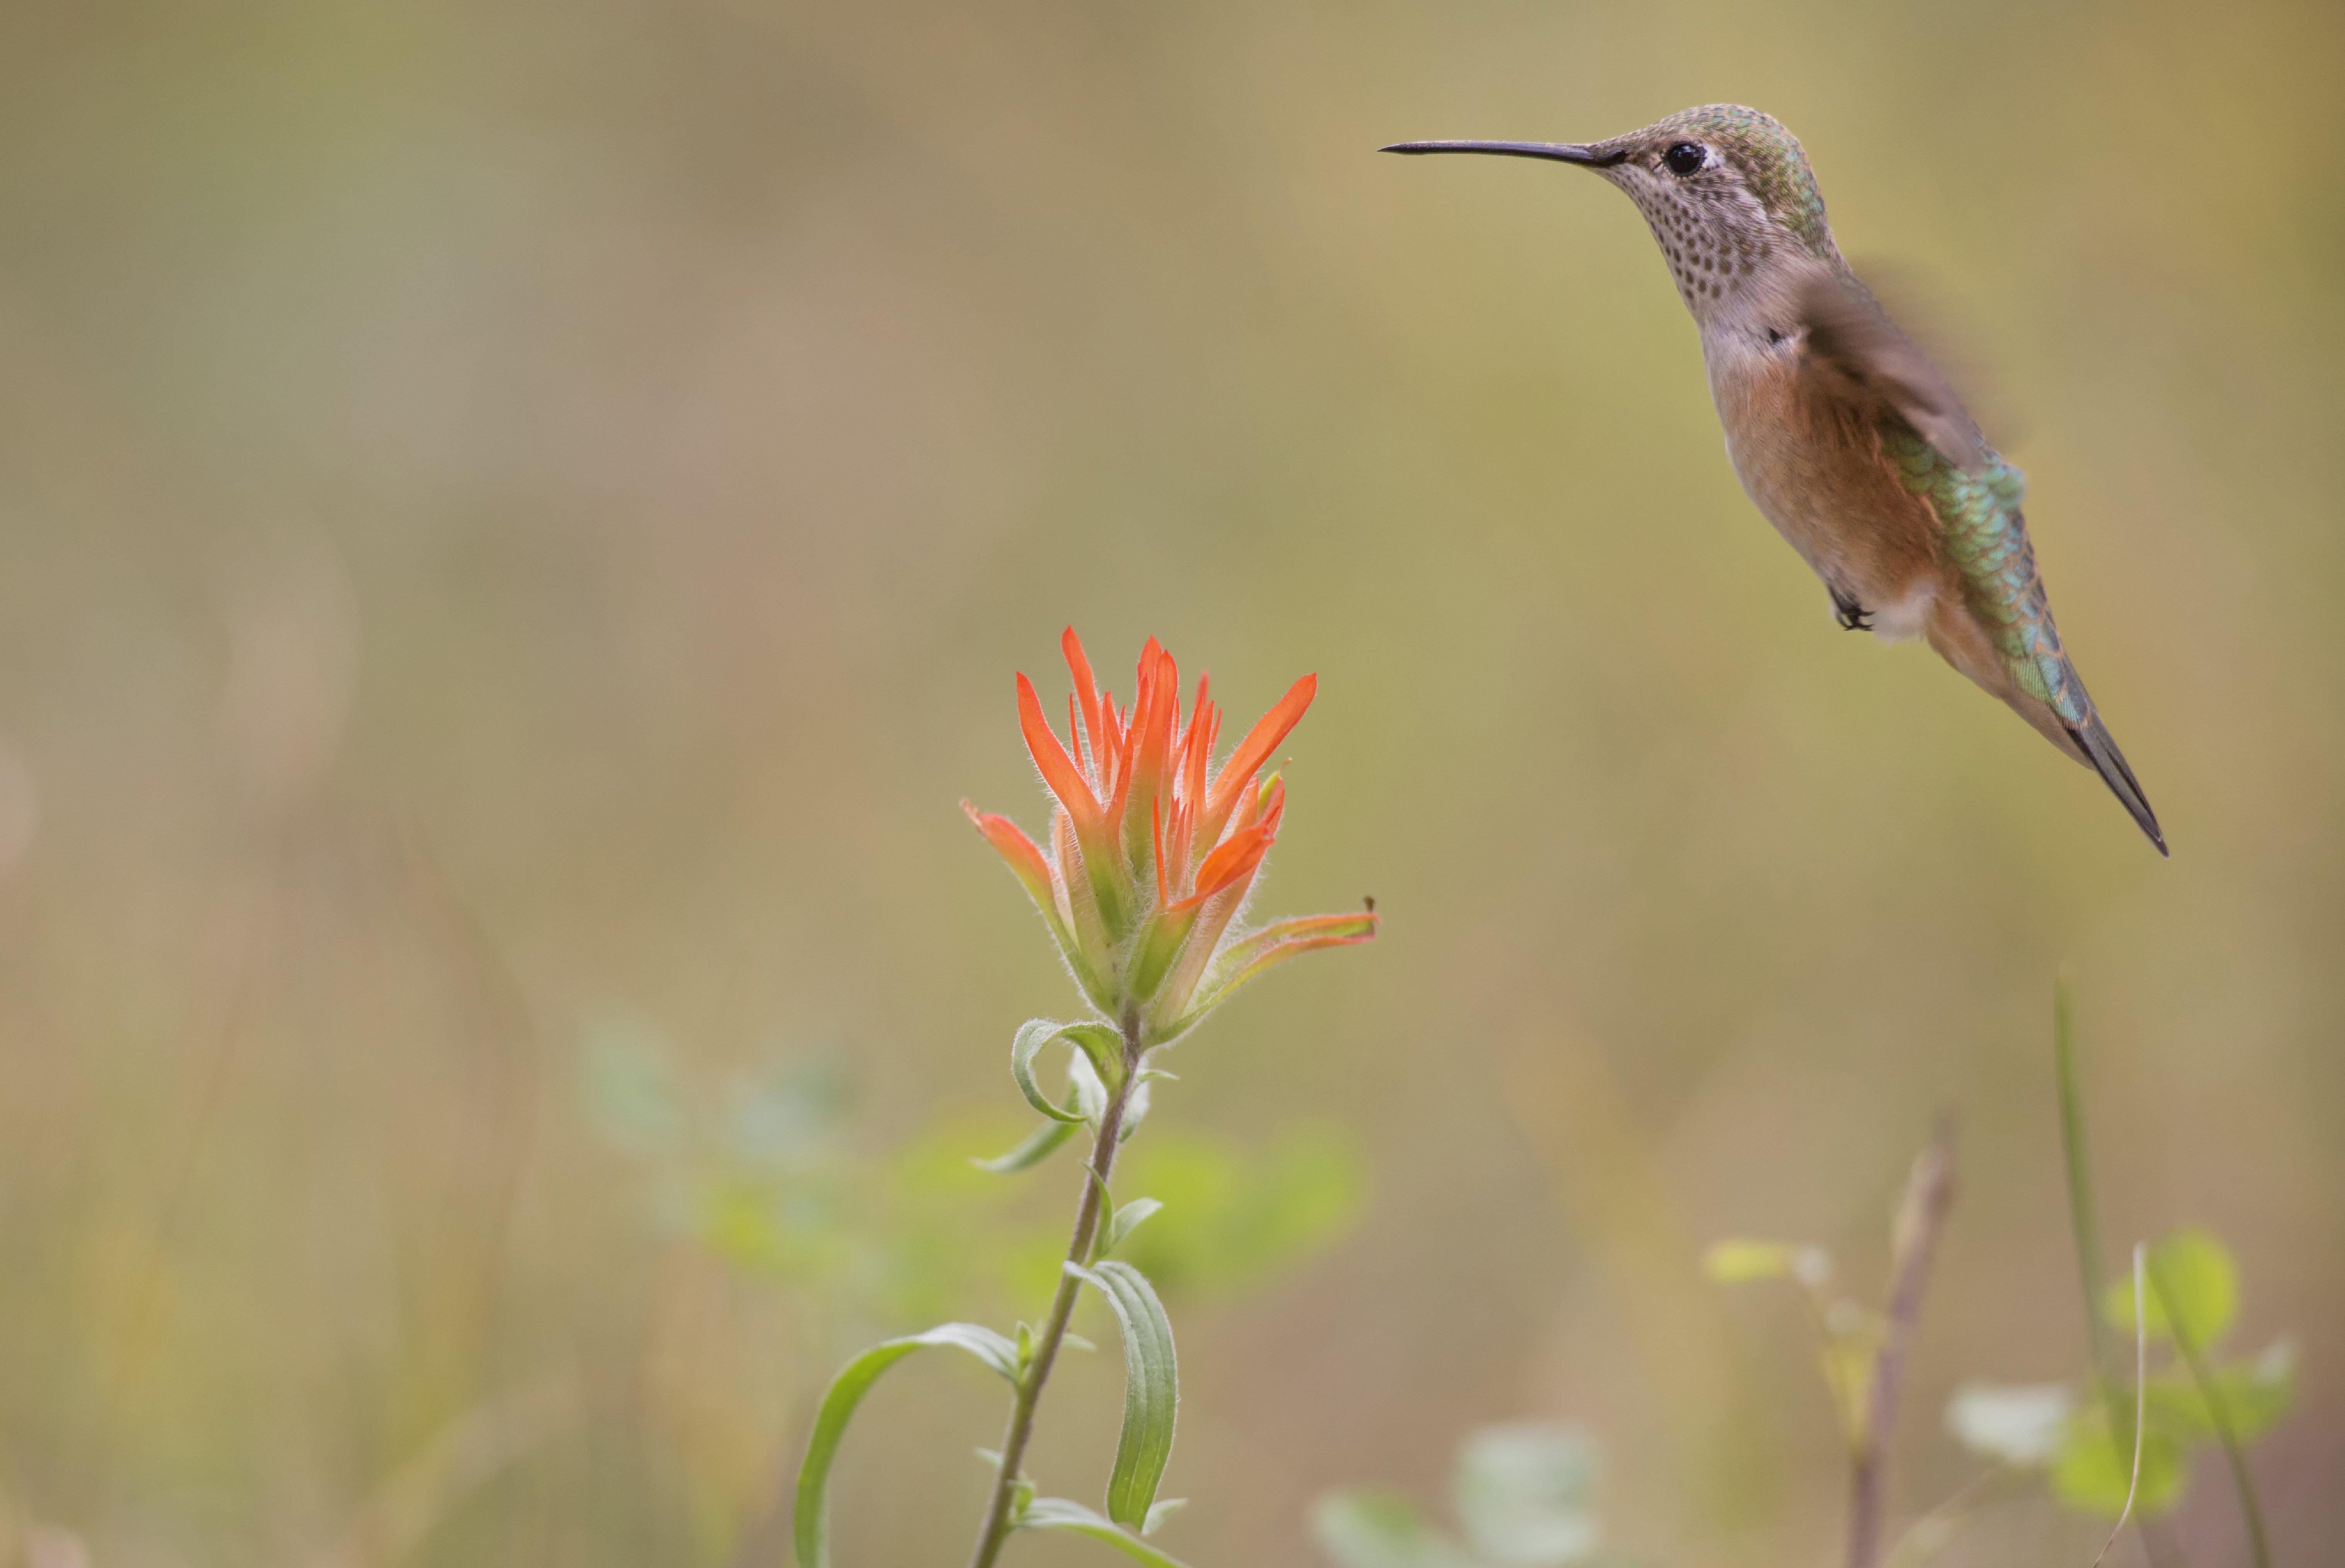 hummingbird hovering near indian paintbrush wildflower